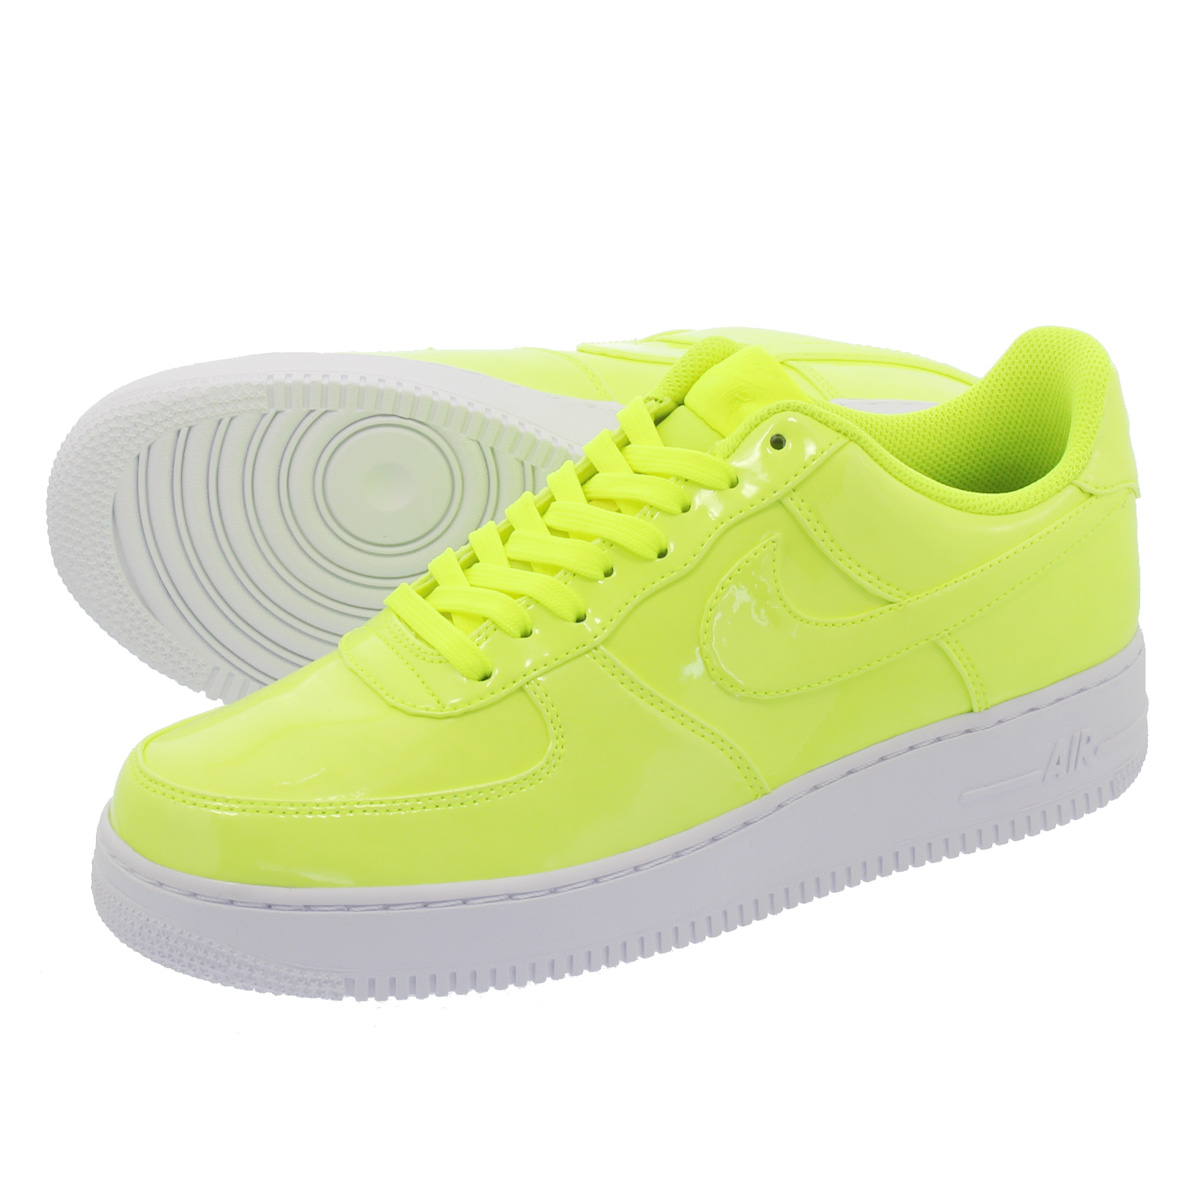 innovative design 329bc 6b57e NIKE AIR FORCE 1  07 LV8 UV Nike air force 1  07 LV8 UV VOLT WHITE